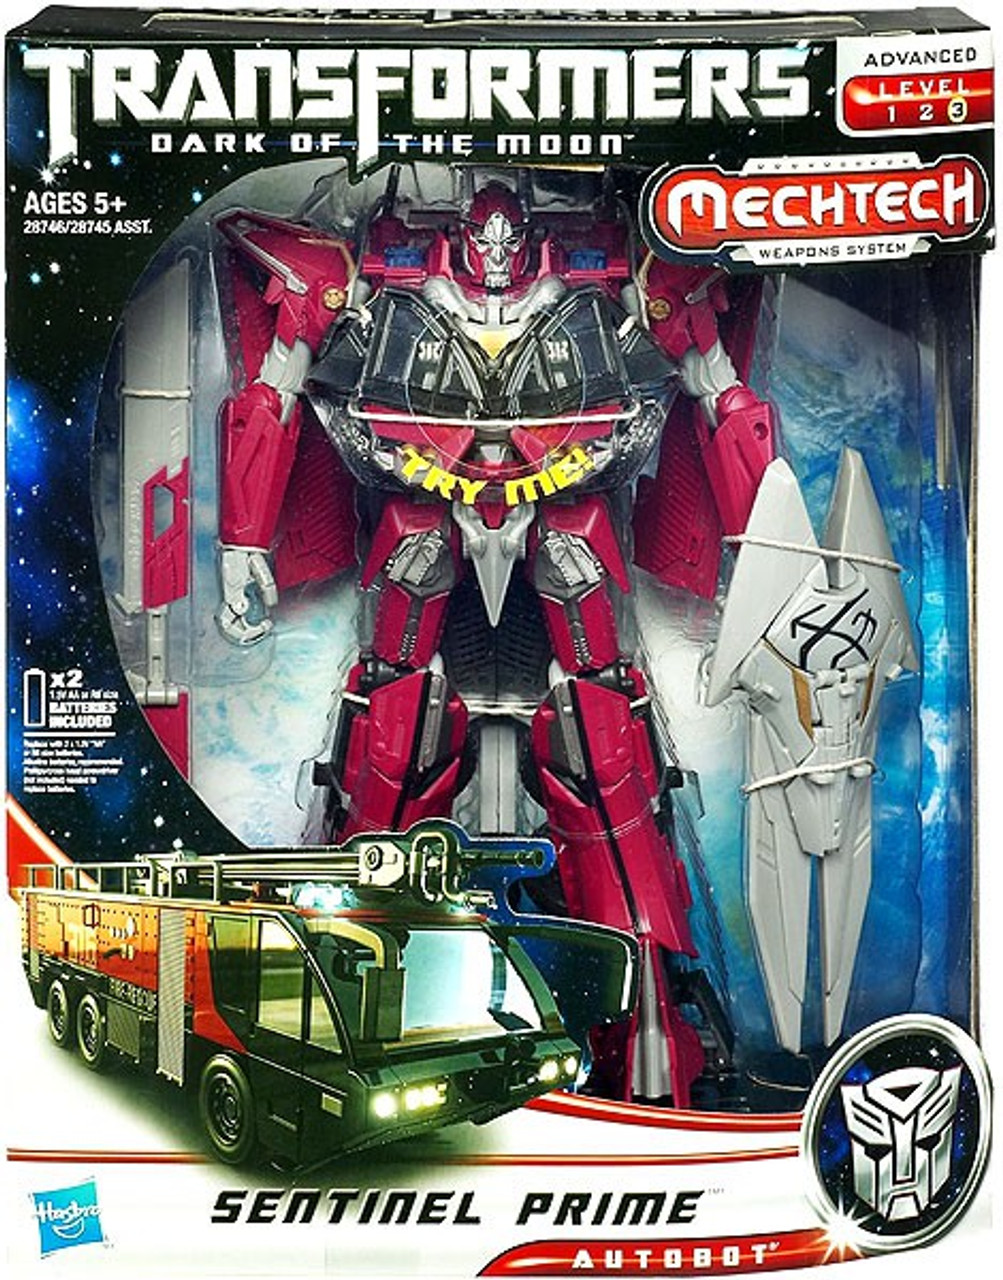 Transformers Dark of the Moon Mechtech Leader Sentinel Prime Leader Action Figure